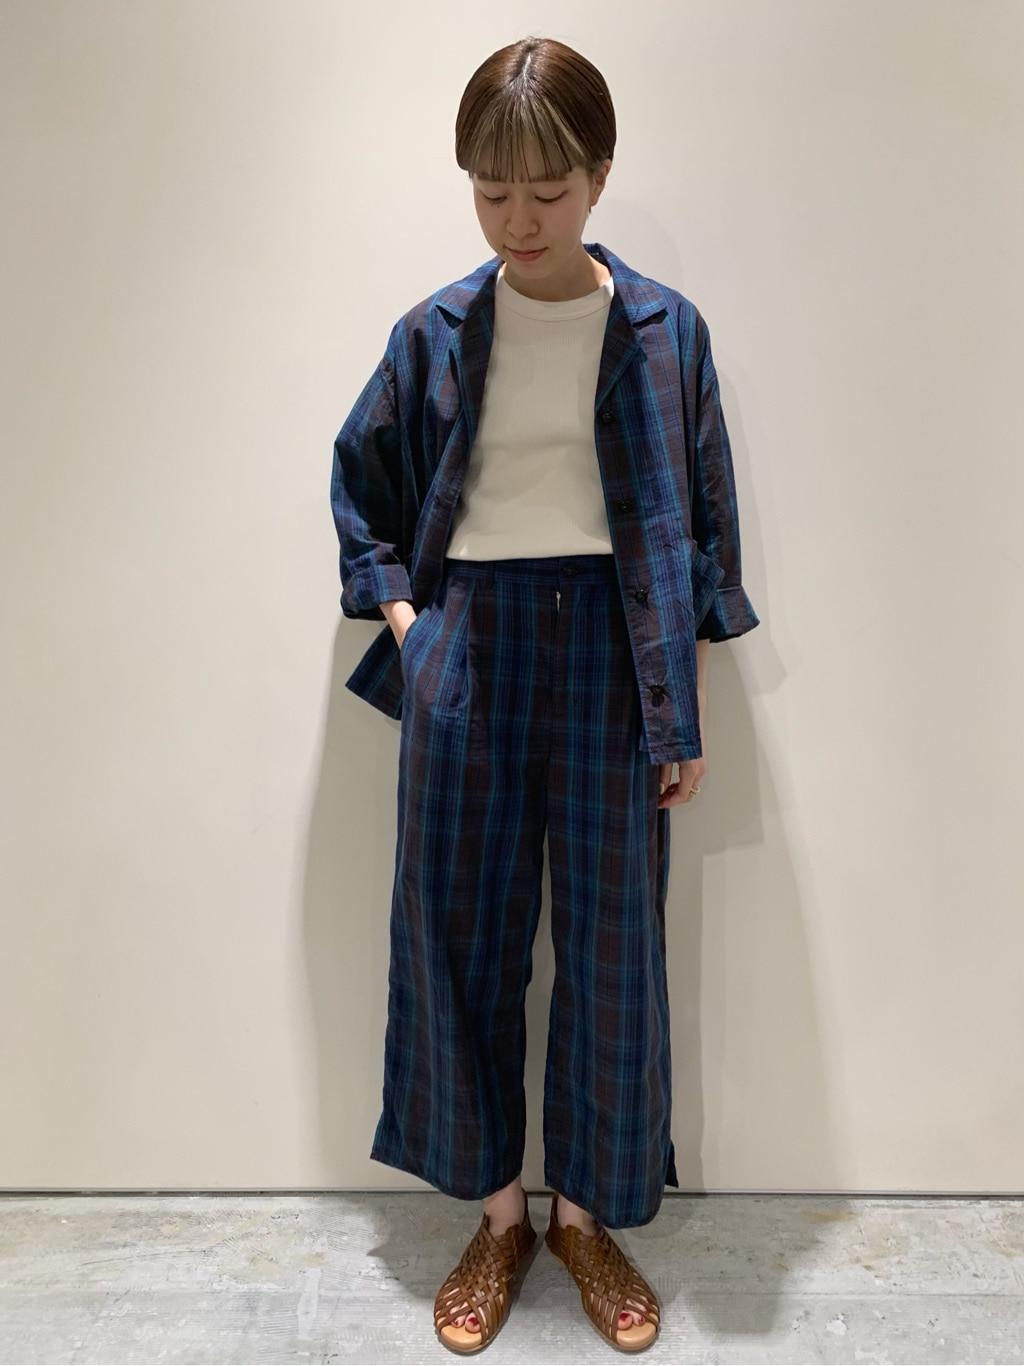 - CHILD WOMAN CHILD WOMAN , PAR ICI ルミネ横浜 身長:158cm 2021.06.02